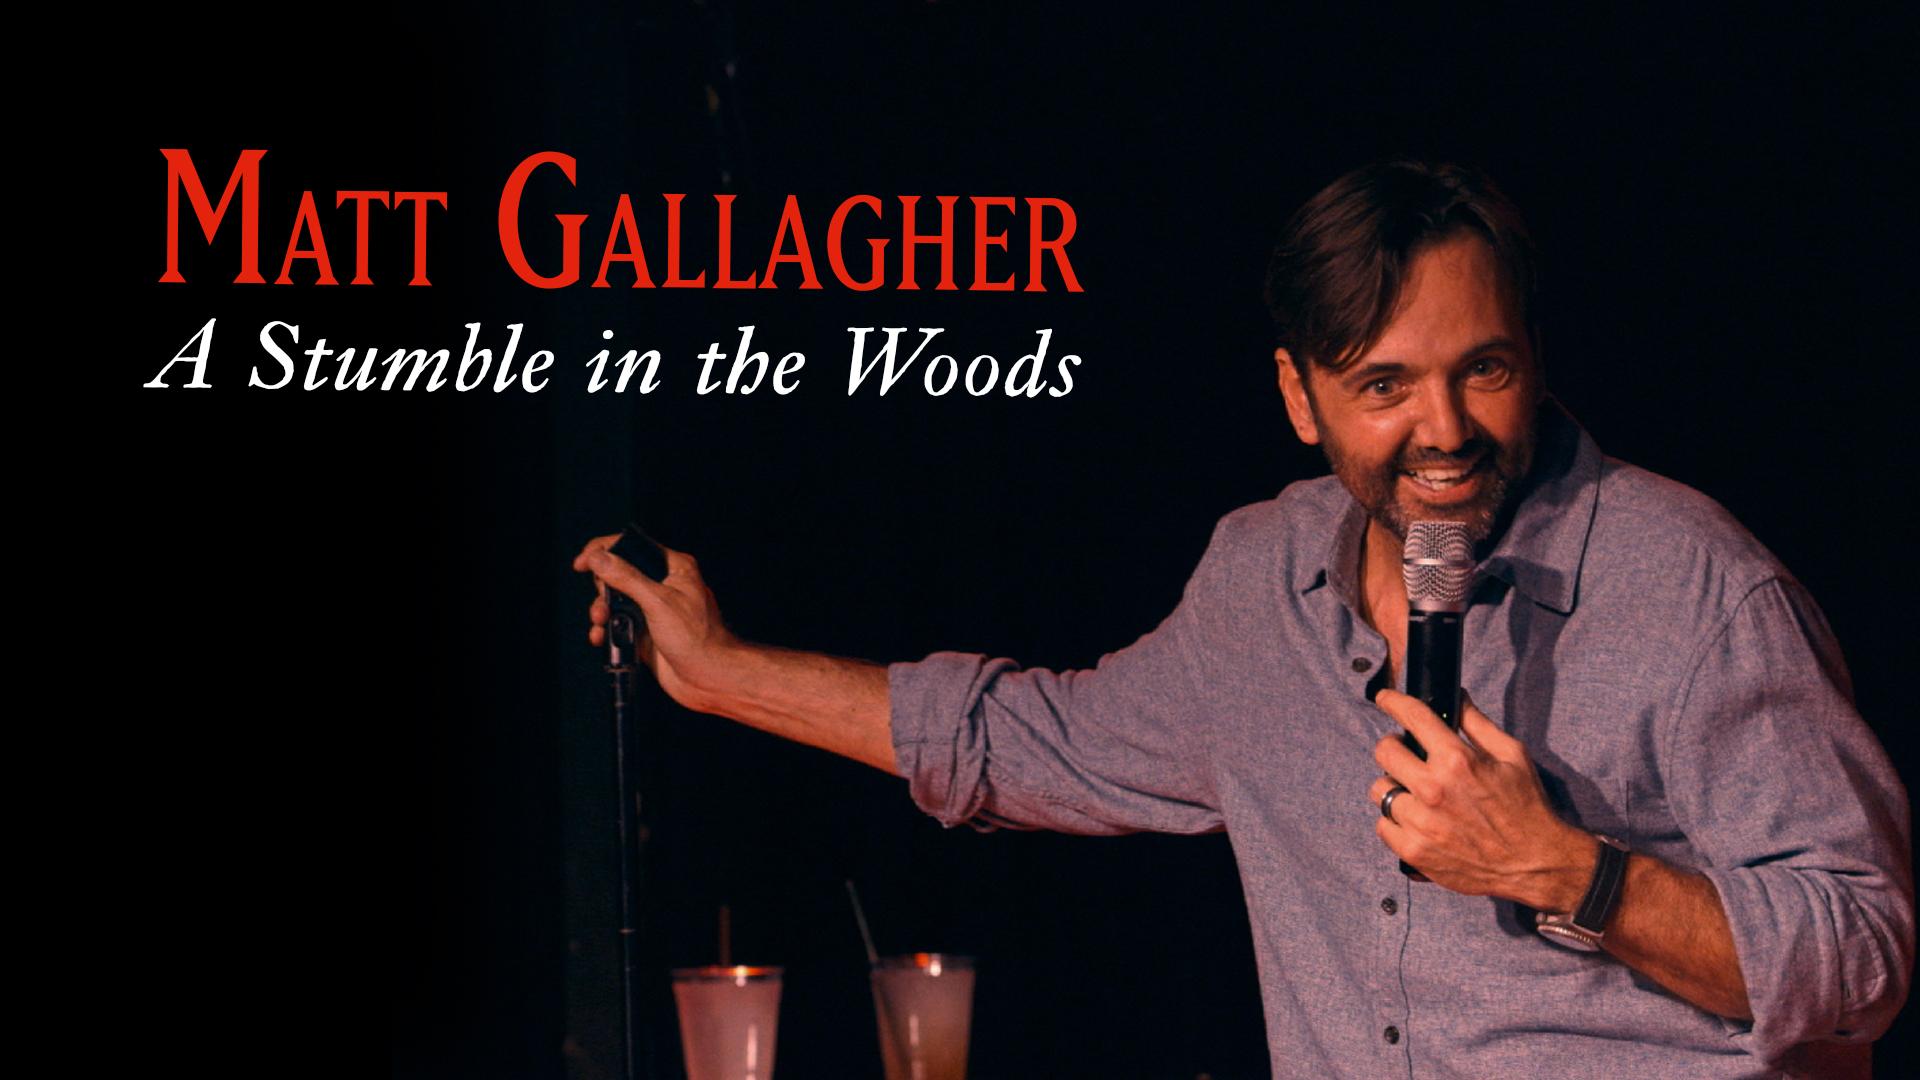 Matt Gallagher: A Stumble In The Woods